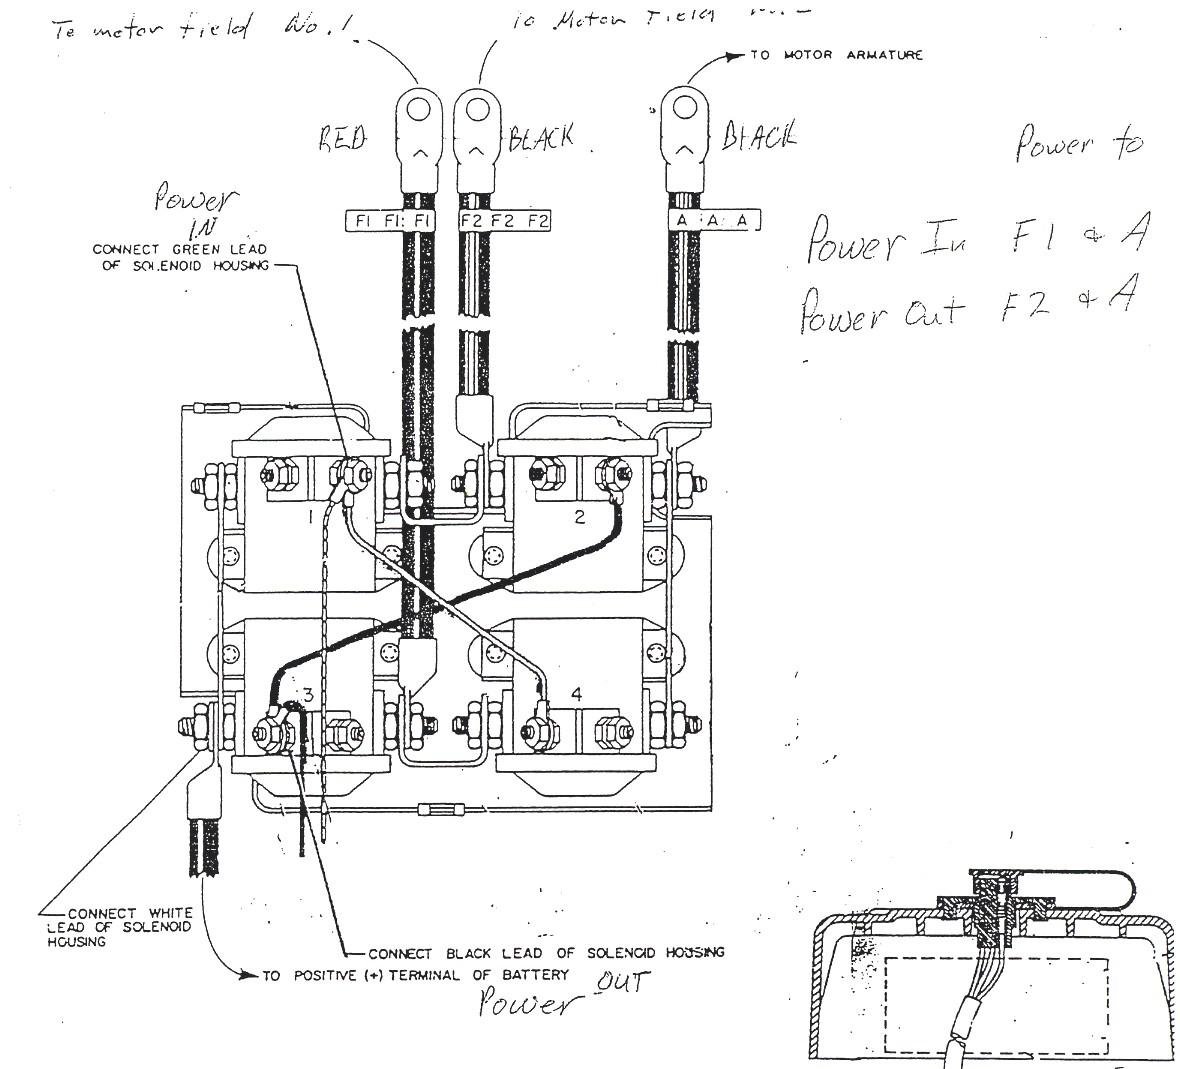 For Atv Winch Wiring Relay Wiring Diagram